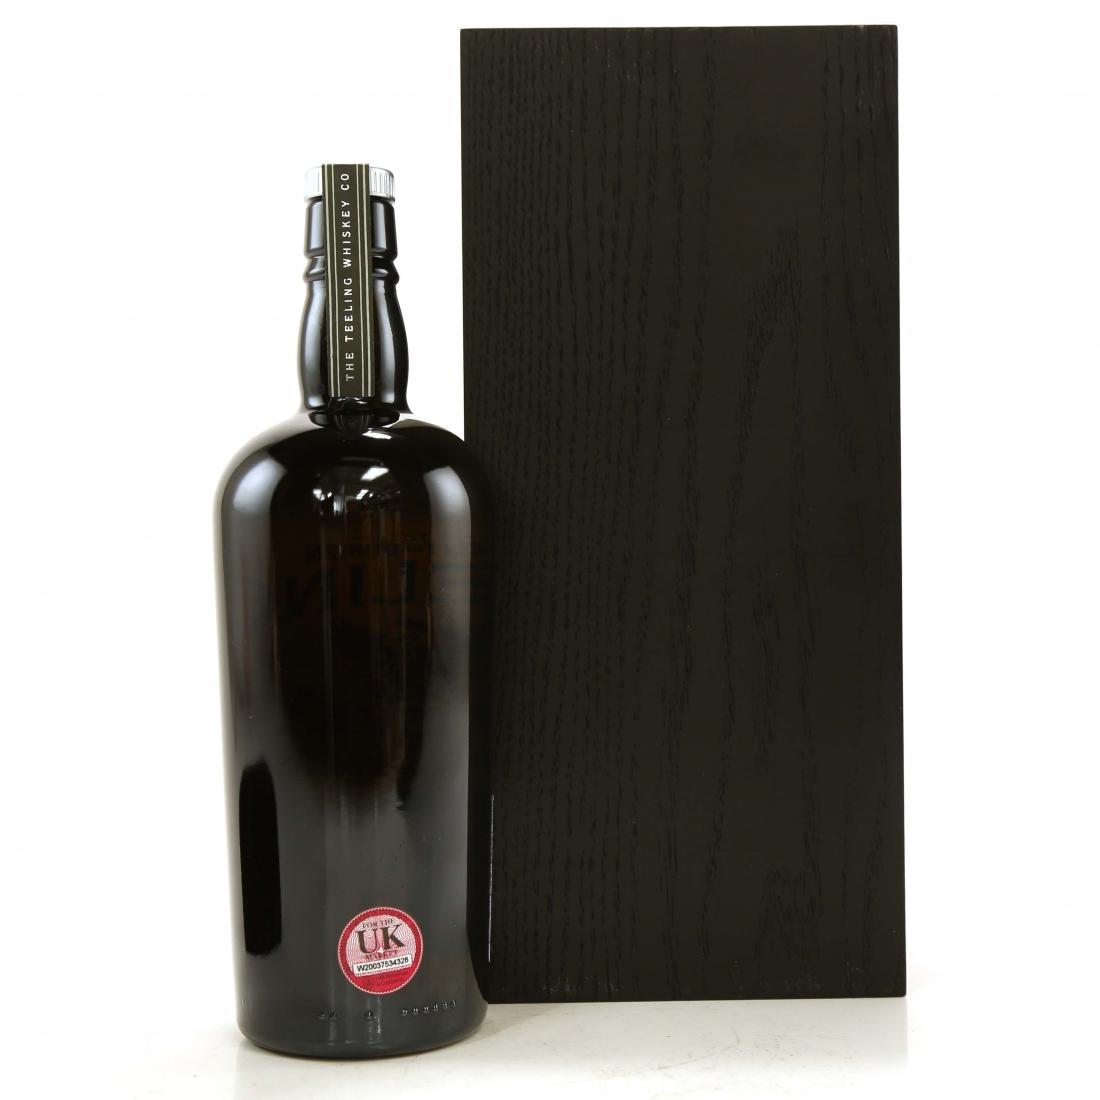 Teeling Celebratory Single Pot Still Whiskey / Bottle #045